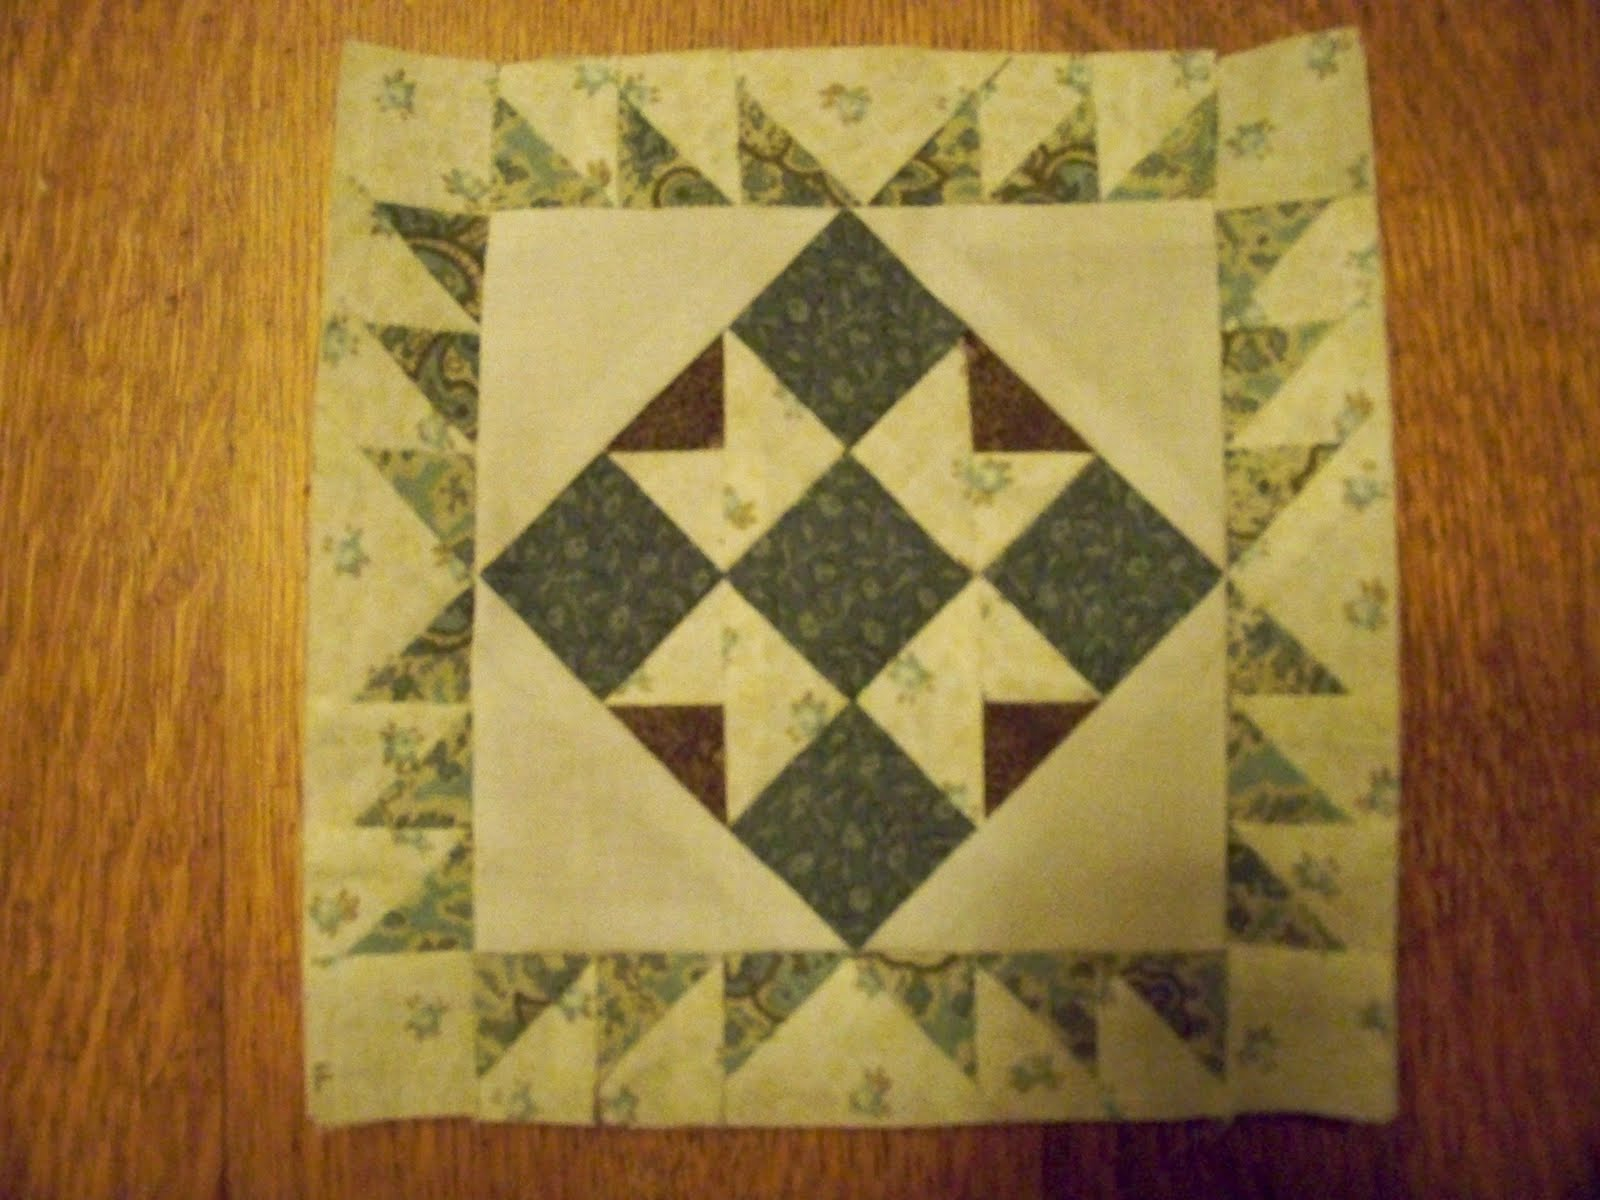 Quilt Patterns On Wisconsin Barns : Judy s Quilts & Ramblin s: Wisconsin Quilt Blocks on Barns #37